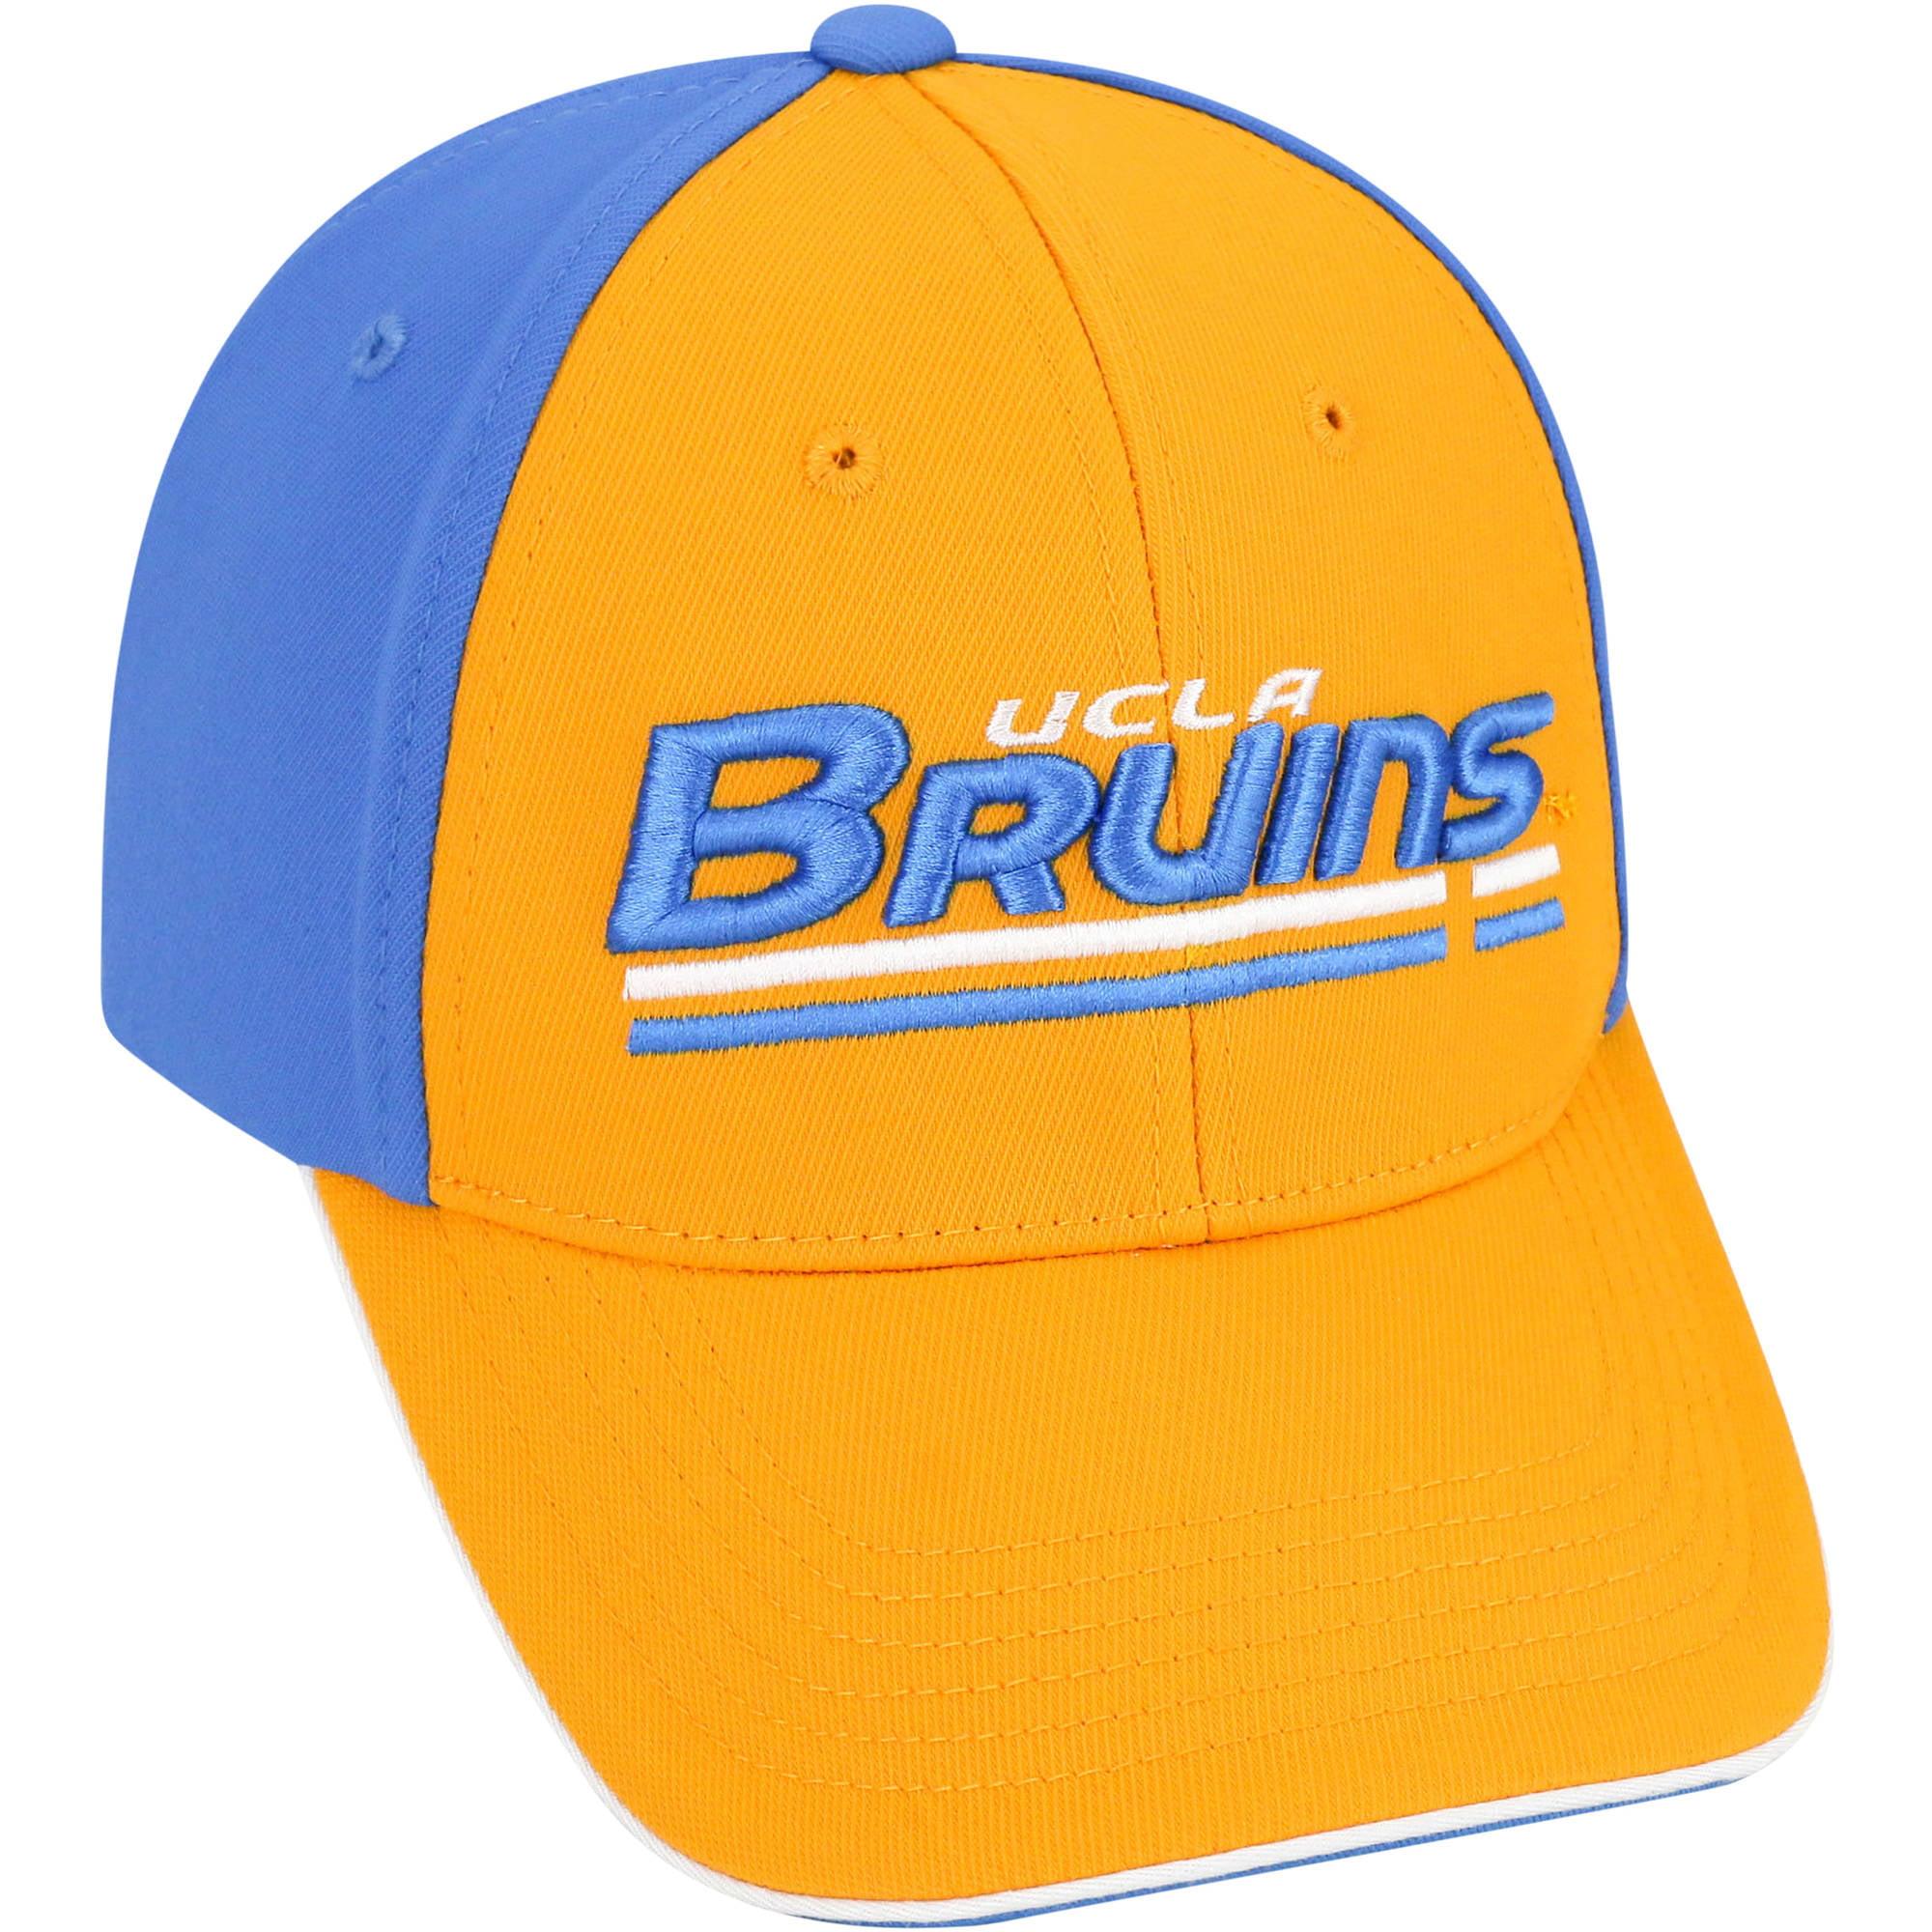 University Of Ucla Bruins Away Two Tone Baseball Cap by